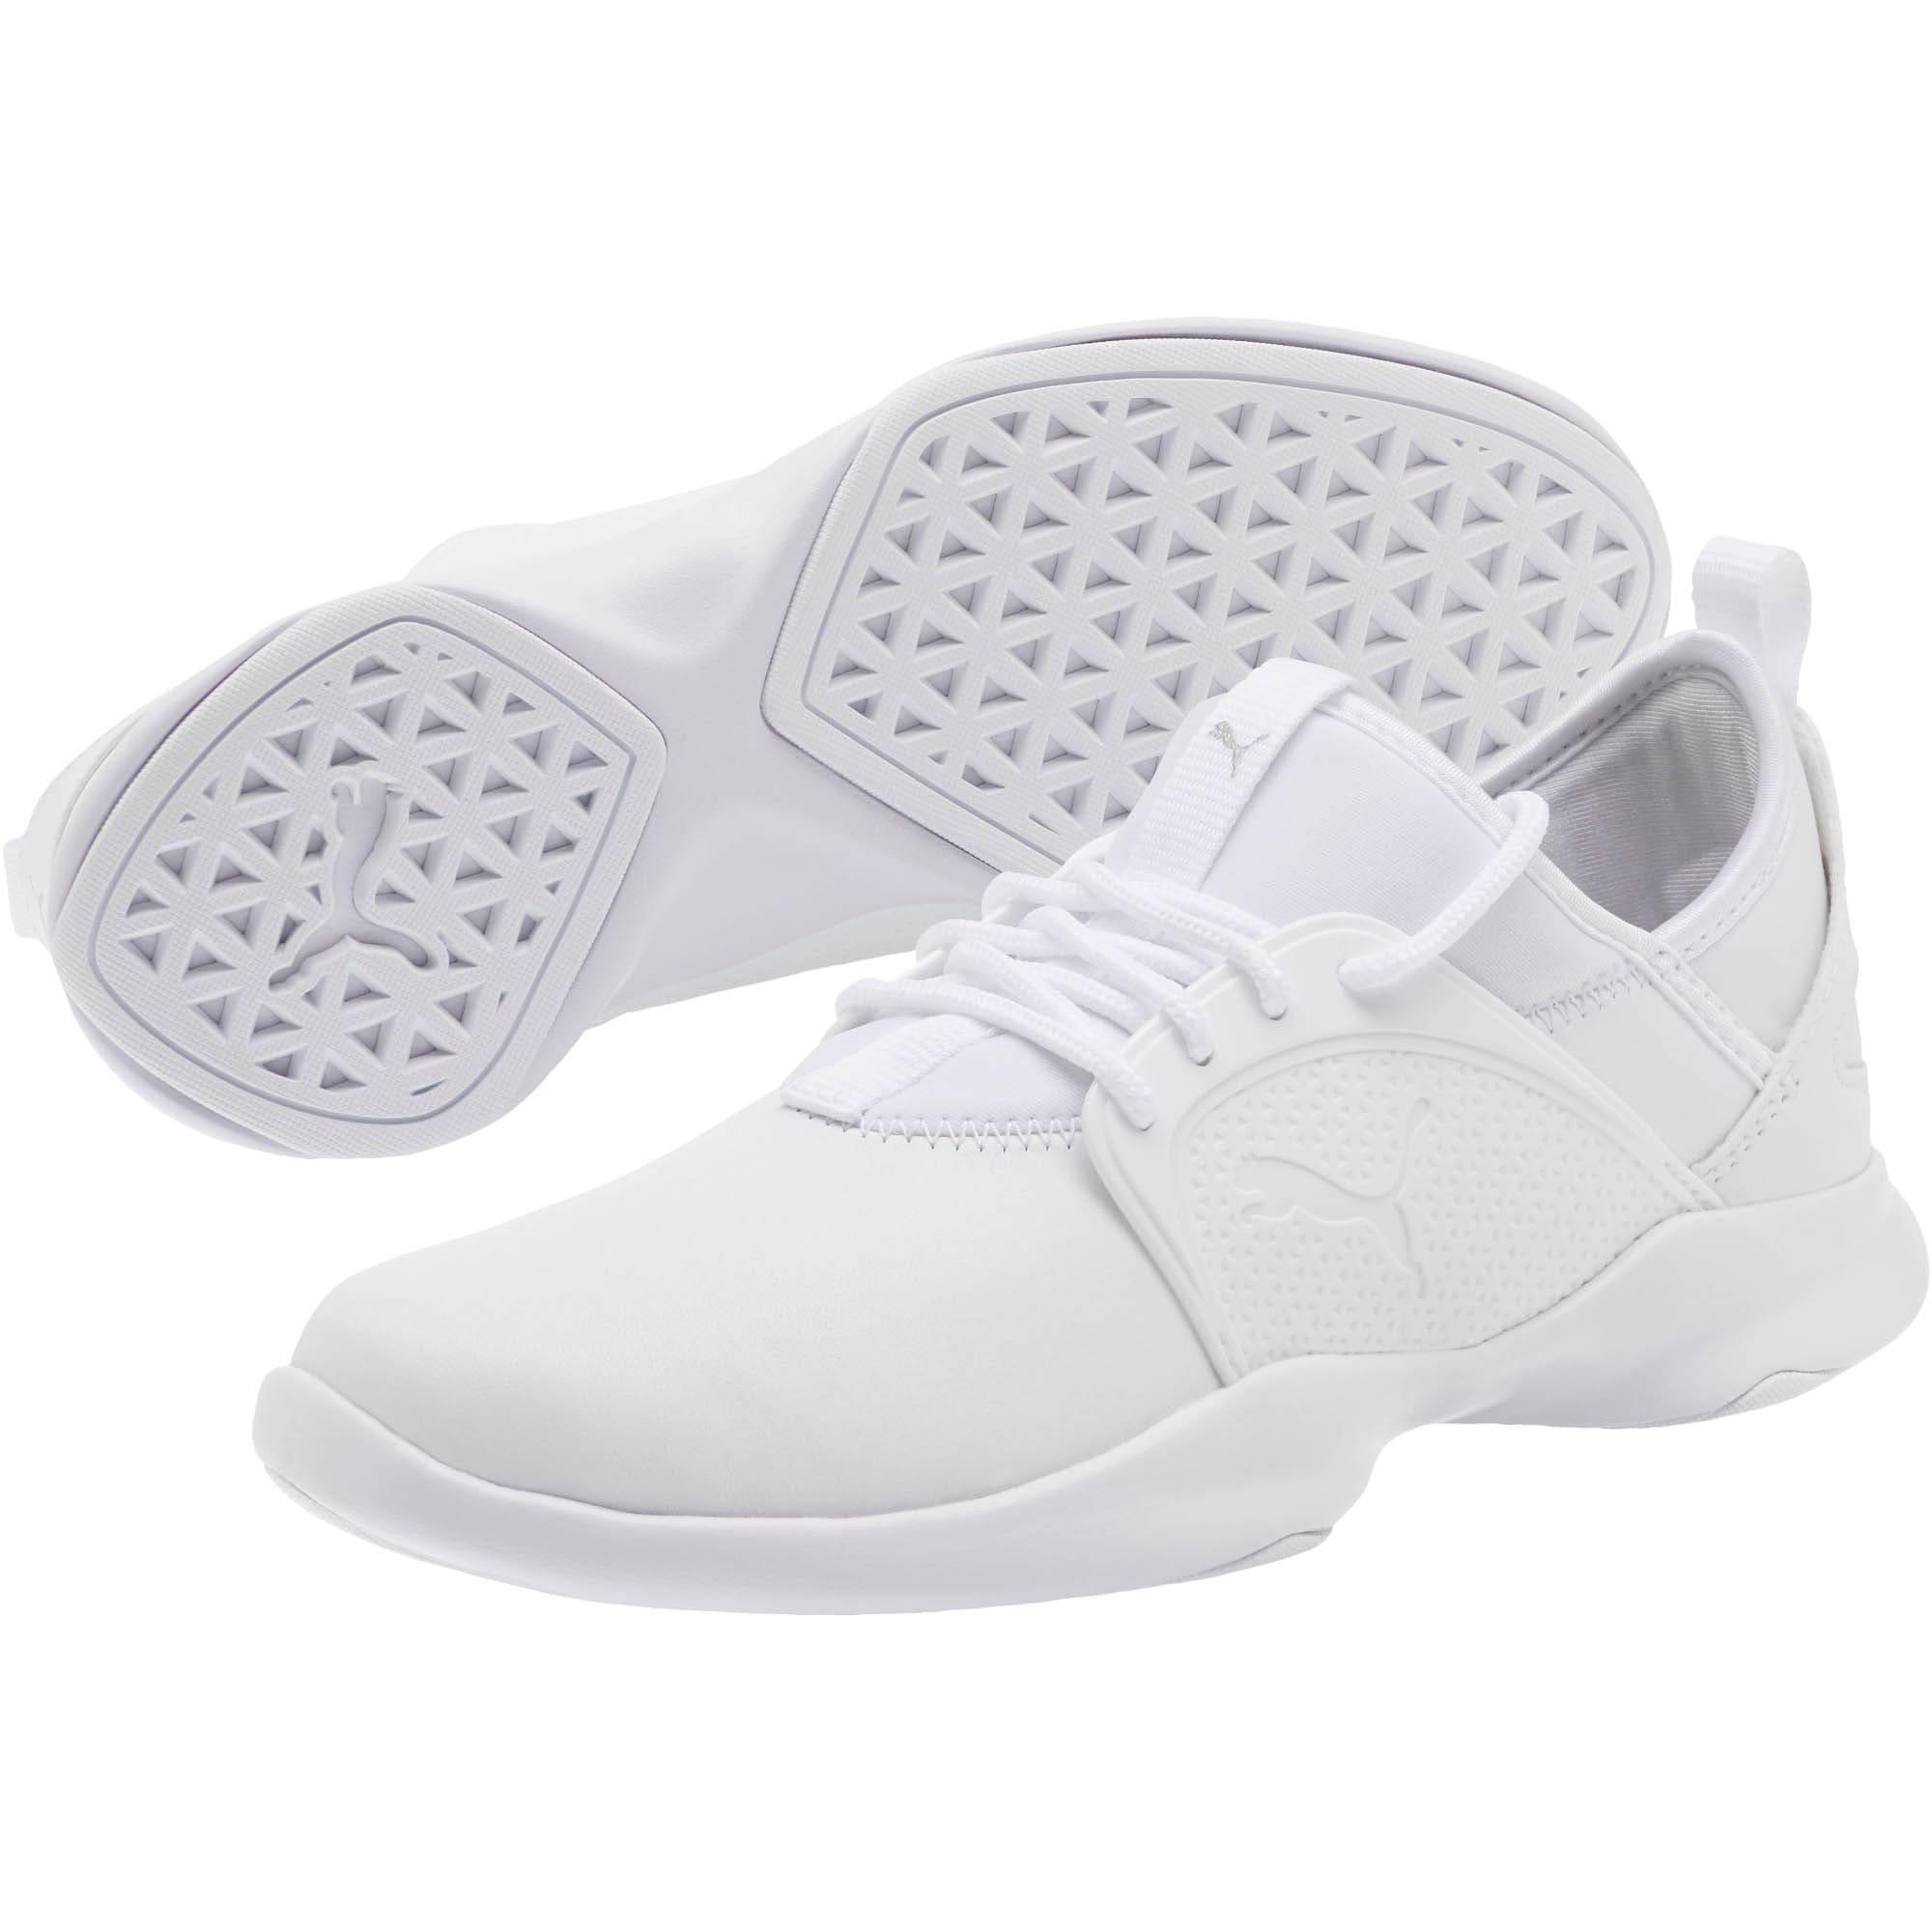 Thumbnail 2 of PUMA Dare Lace Women's Sneakers, P. White-P. White-P. White, medium